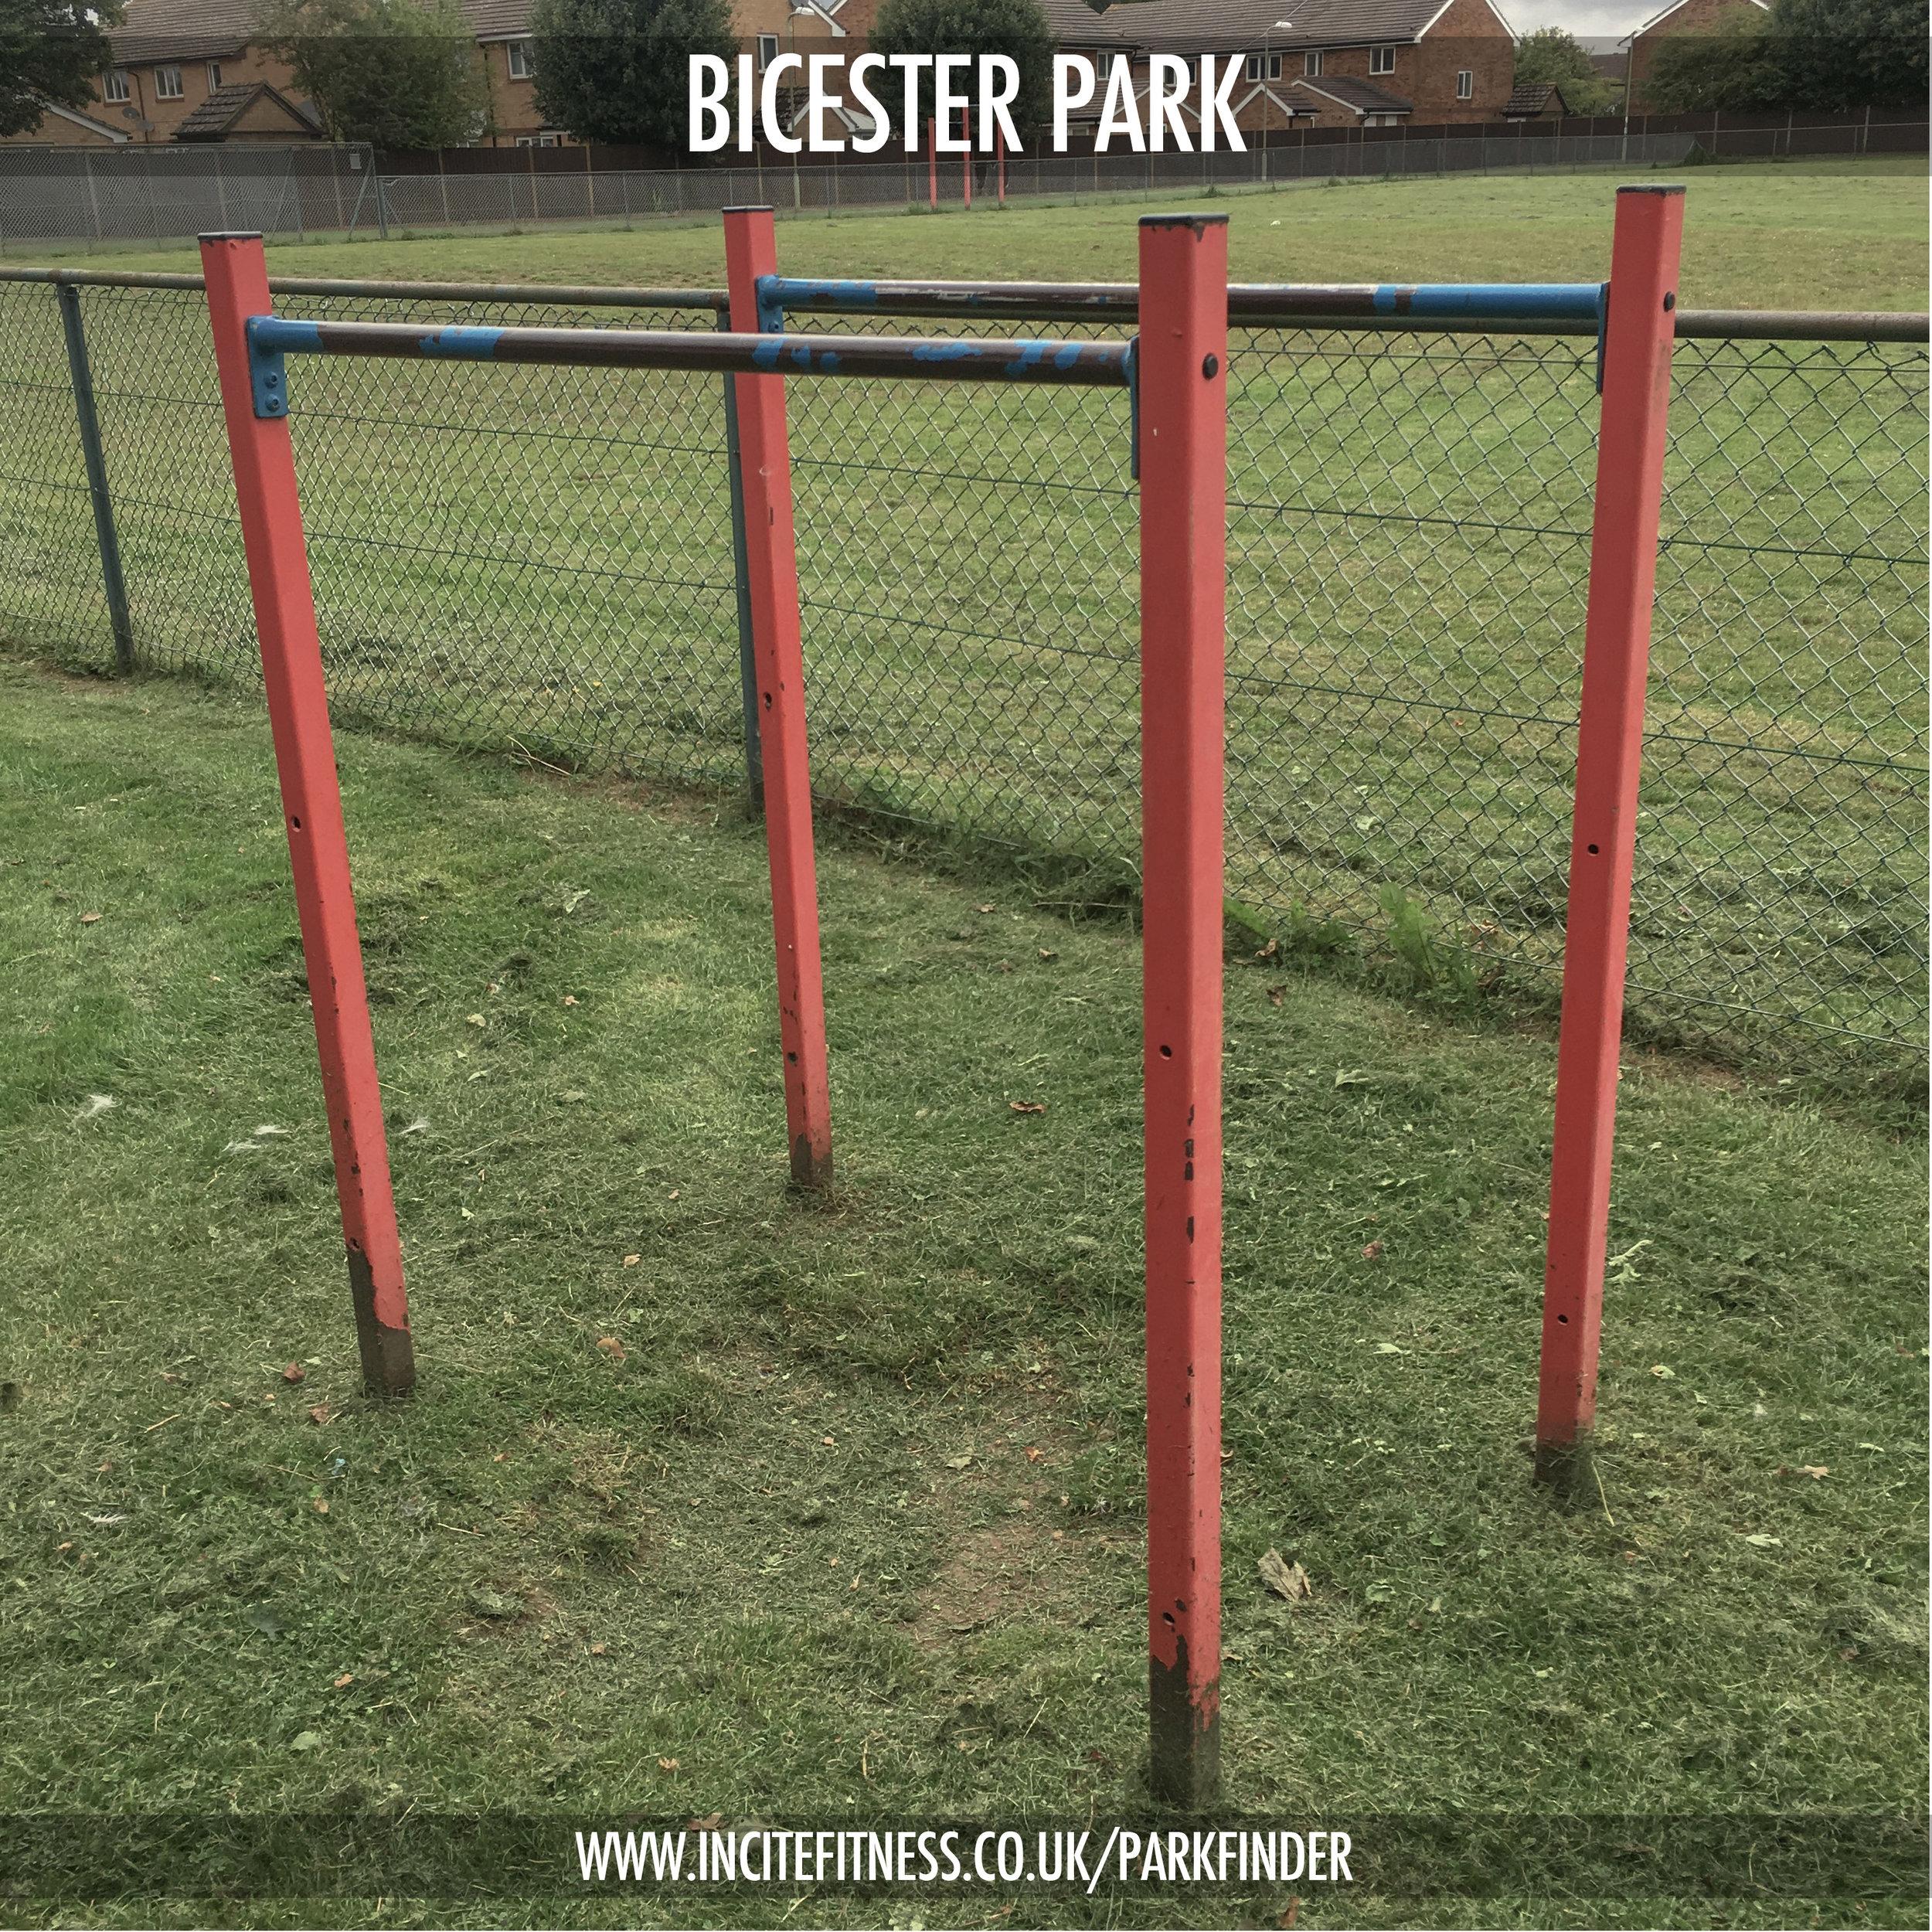 Bicester park 05 wide dips.jpg